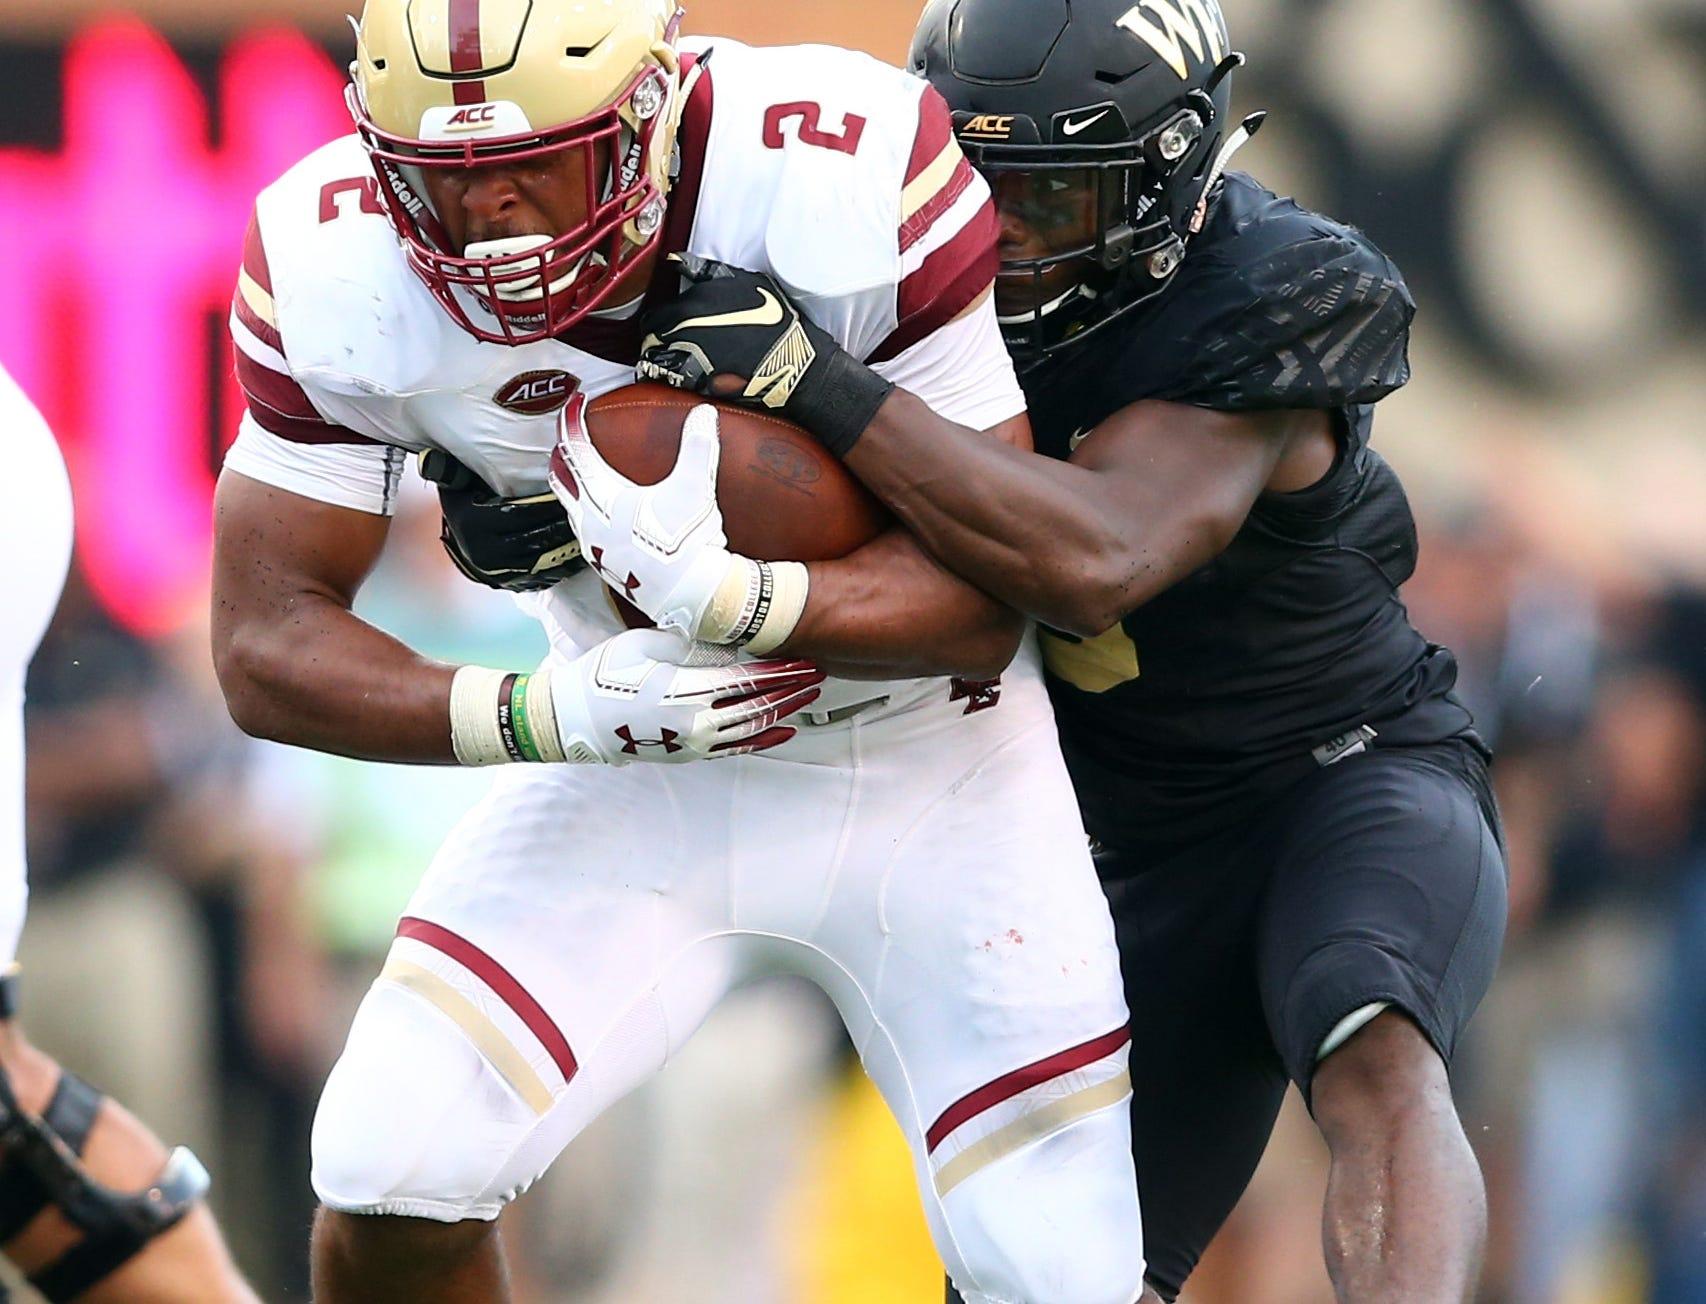 Purdue opponent preview | Boston College seeking best start since 2007